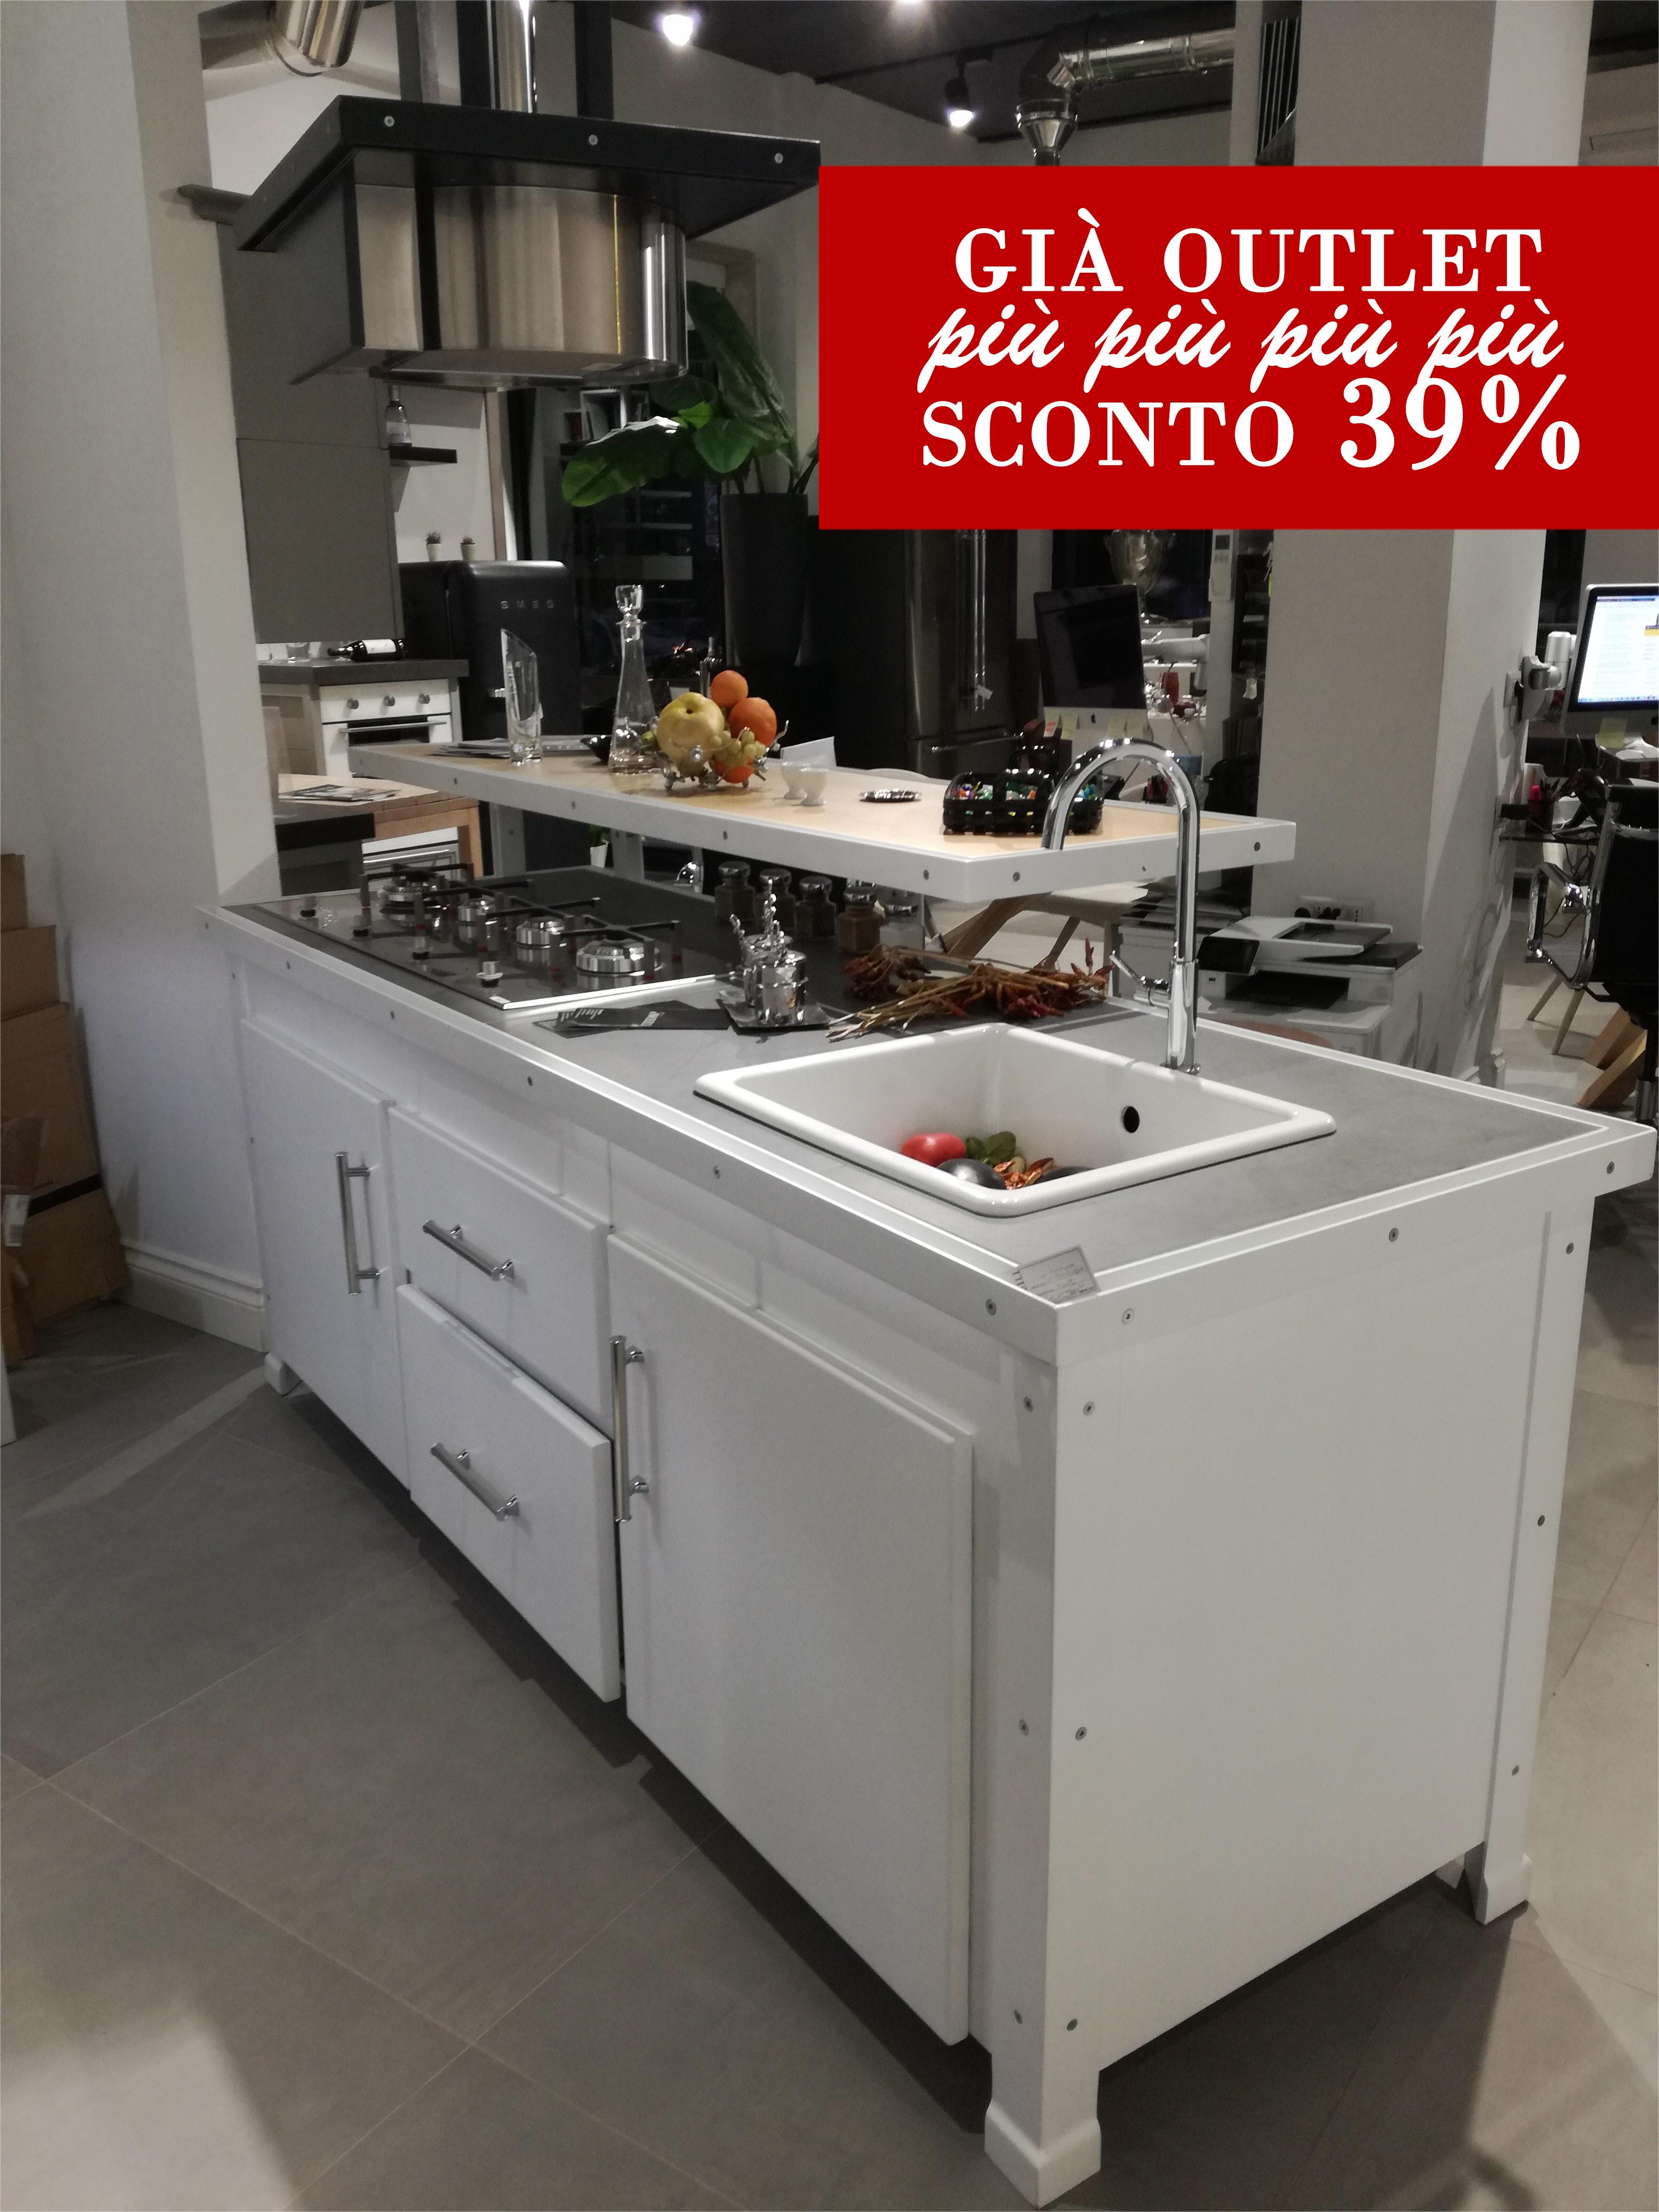 SCONTO -39% CUCINE MODERNE | iNobili Casa - Cucine su misura a Roma